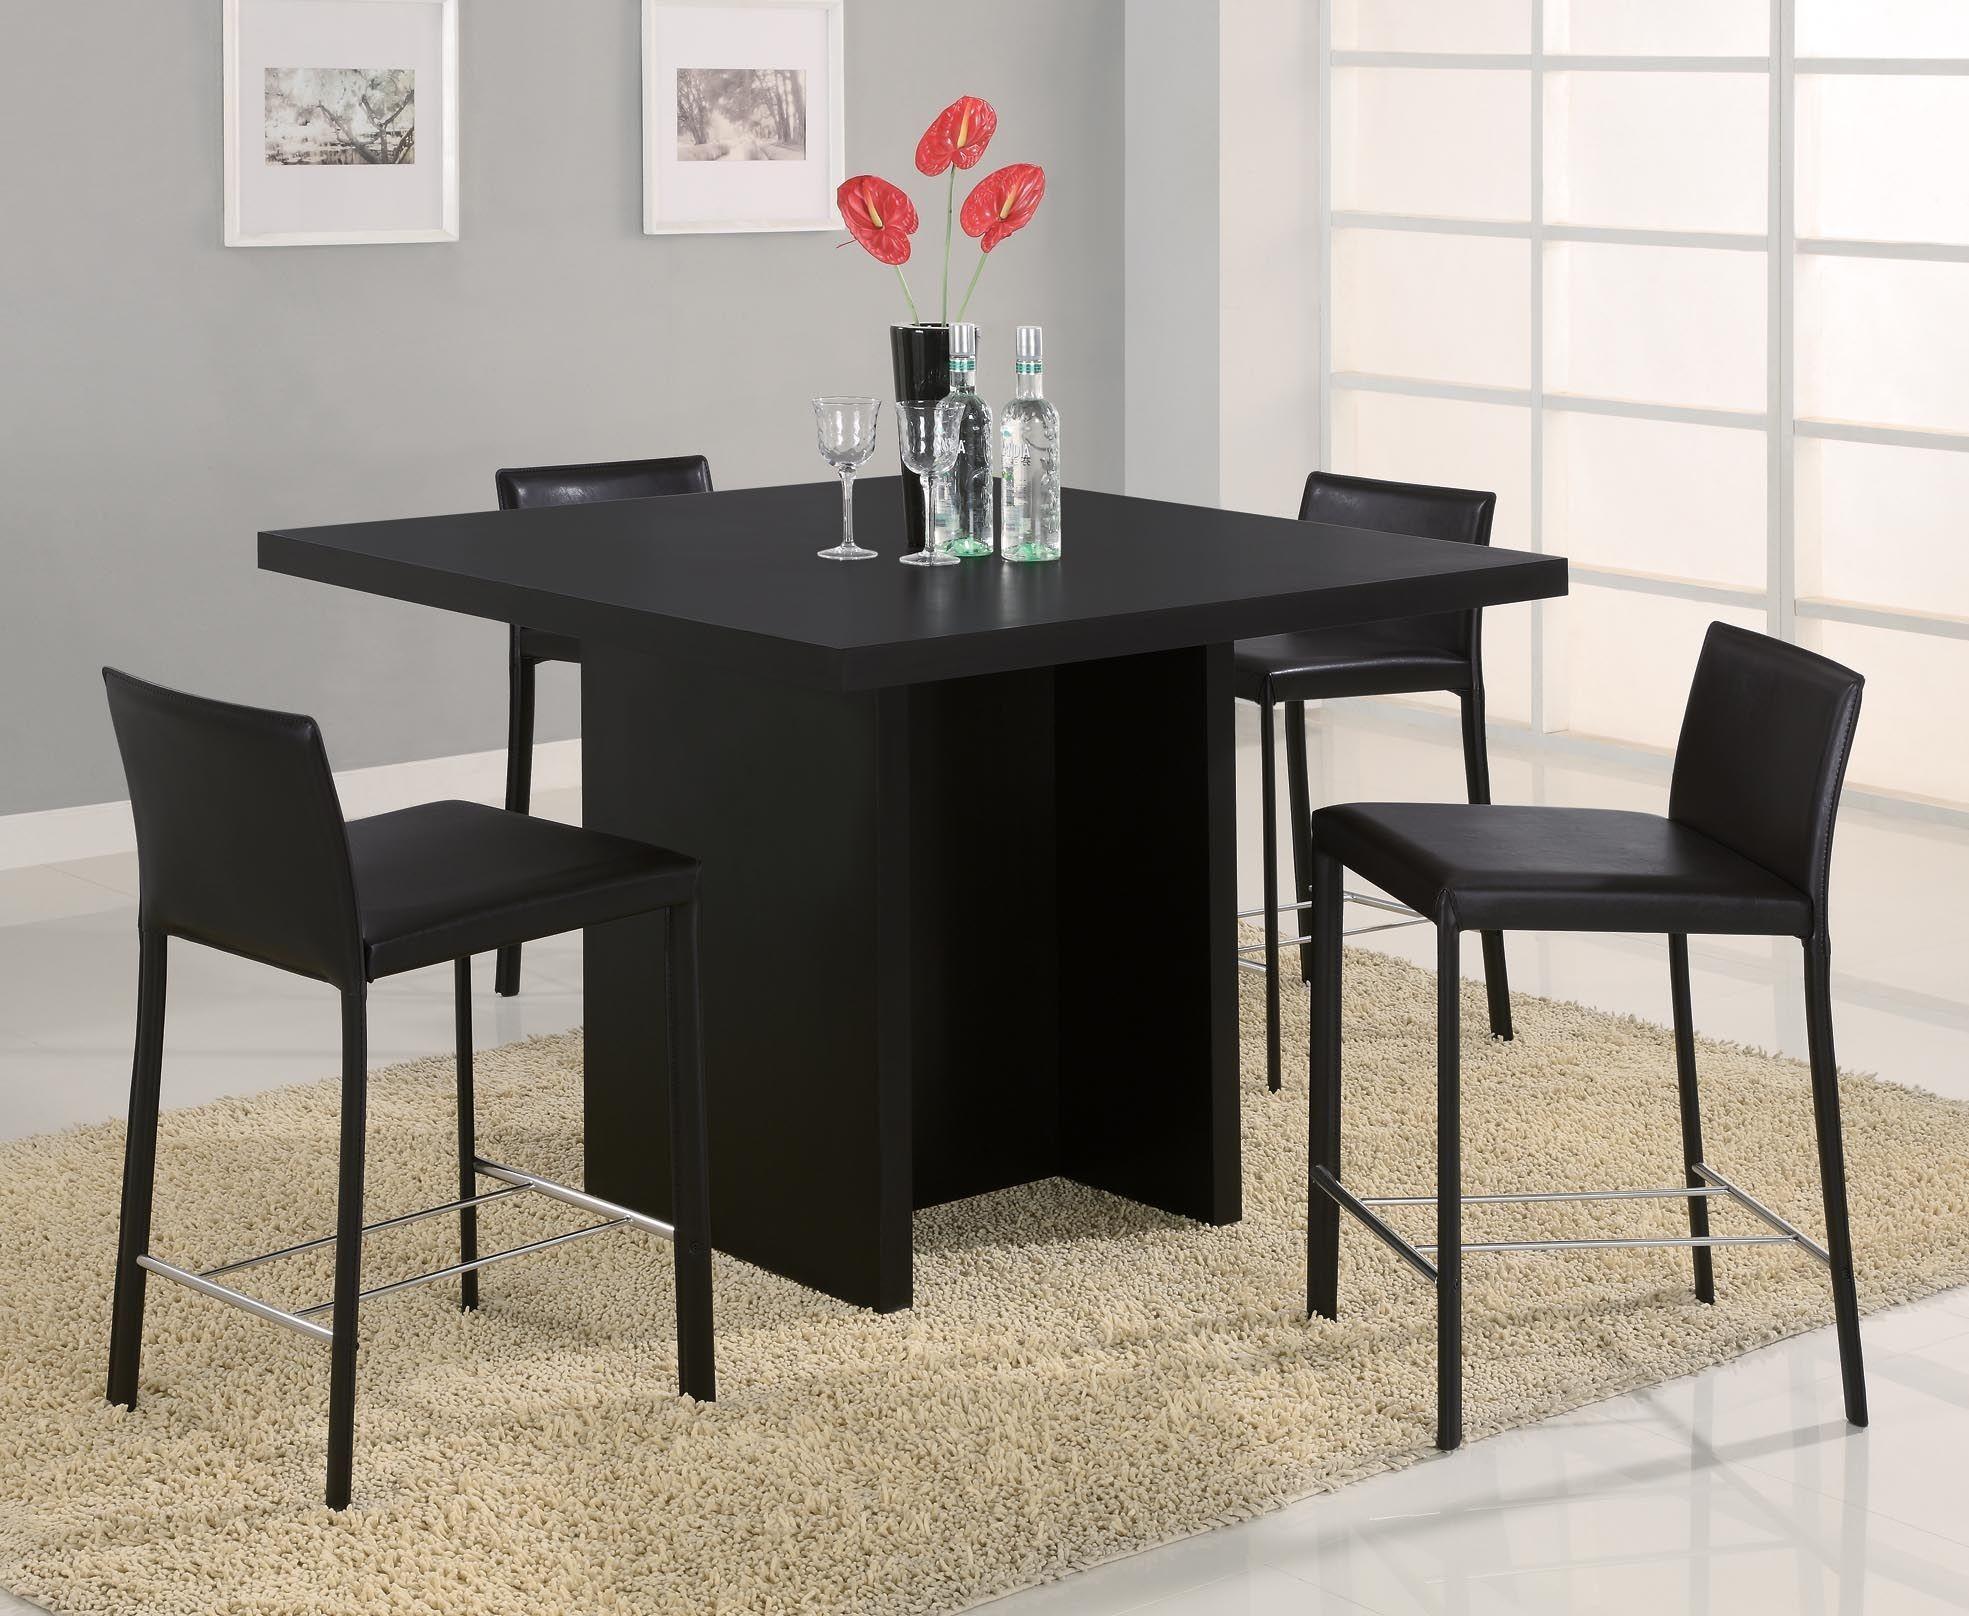 Black Square Pedestal Dining Table, 1380, Monarch. Writing Desks For Sale. Inexpensive Kitchen Table Sets. Oak Sofa Table. Cool Desk Gifts. Corner Computer Desks With Hutch. Symantec Service Desk. Leaning Bookcase With Desk. Drawer Freezer